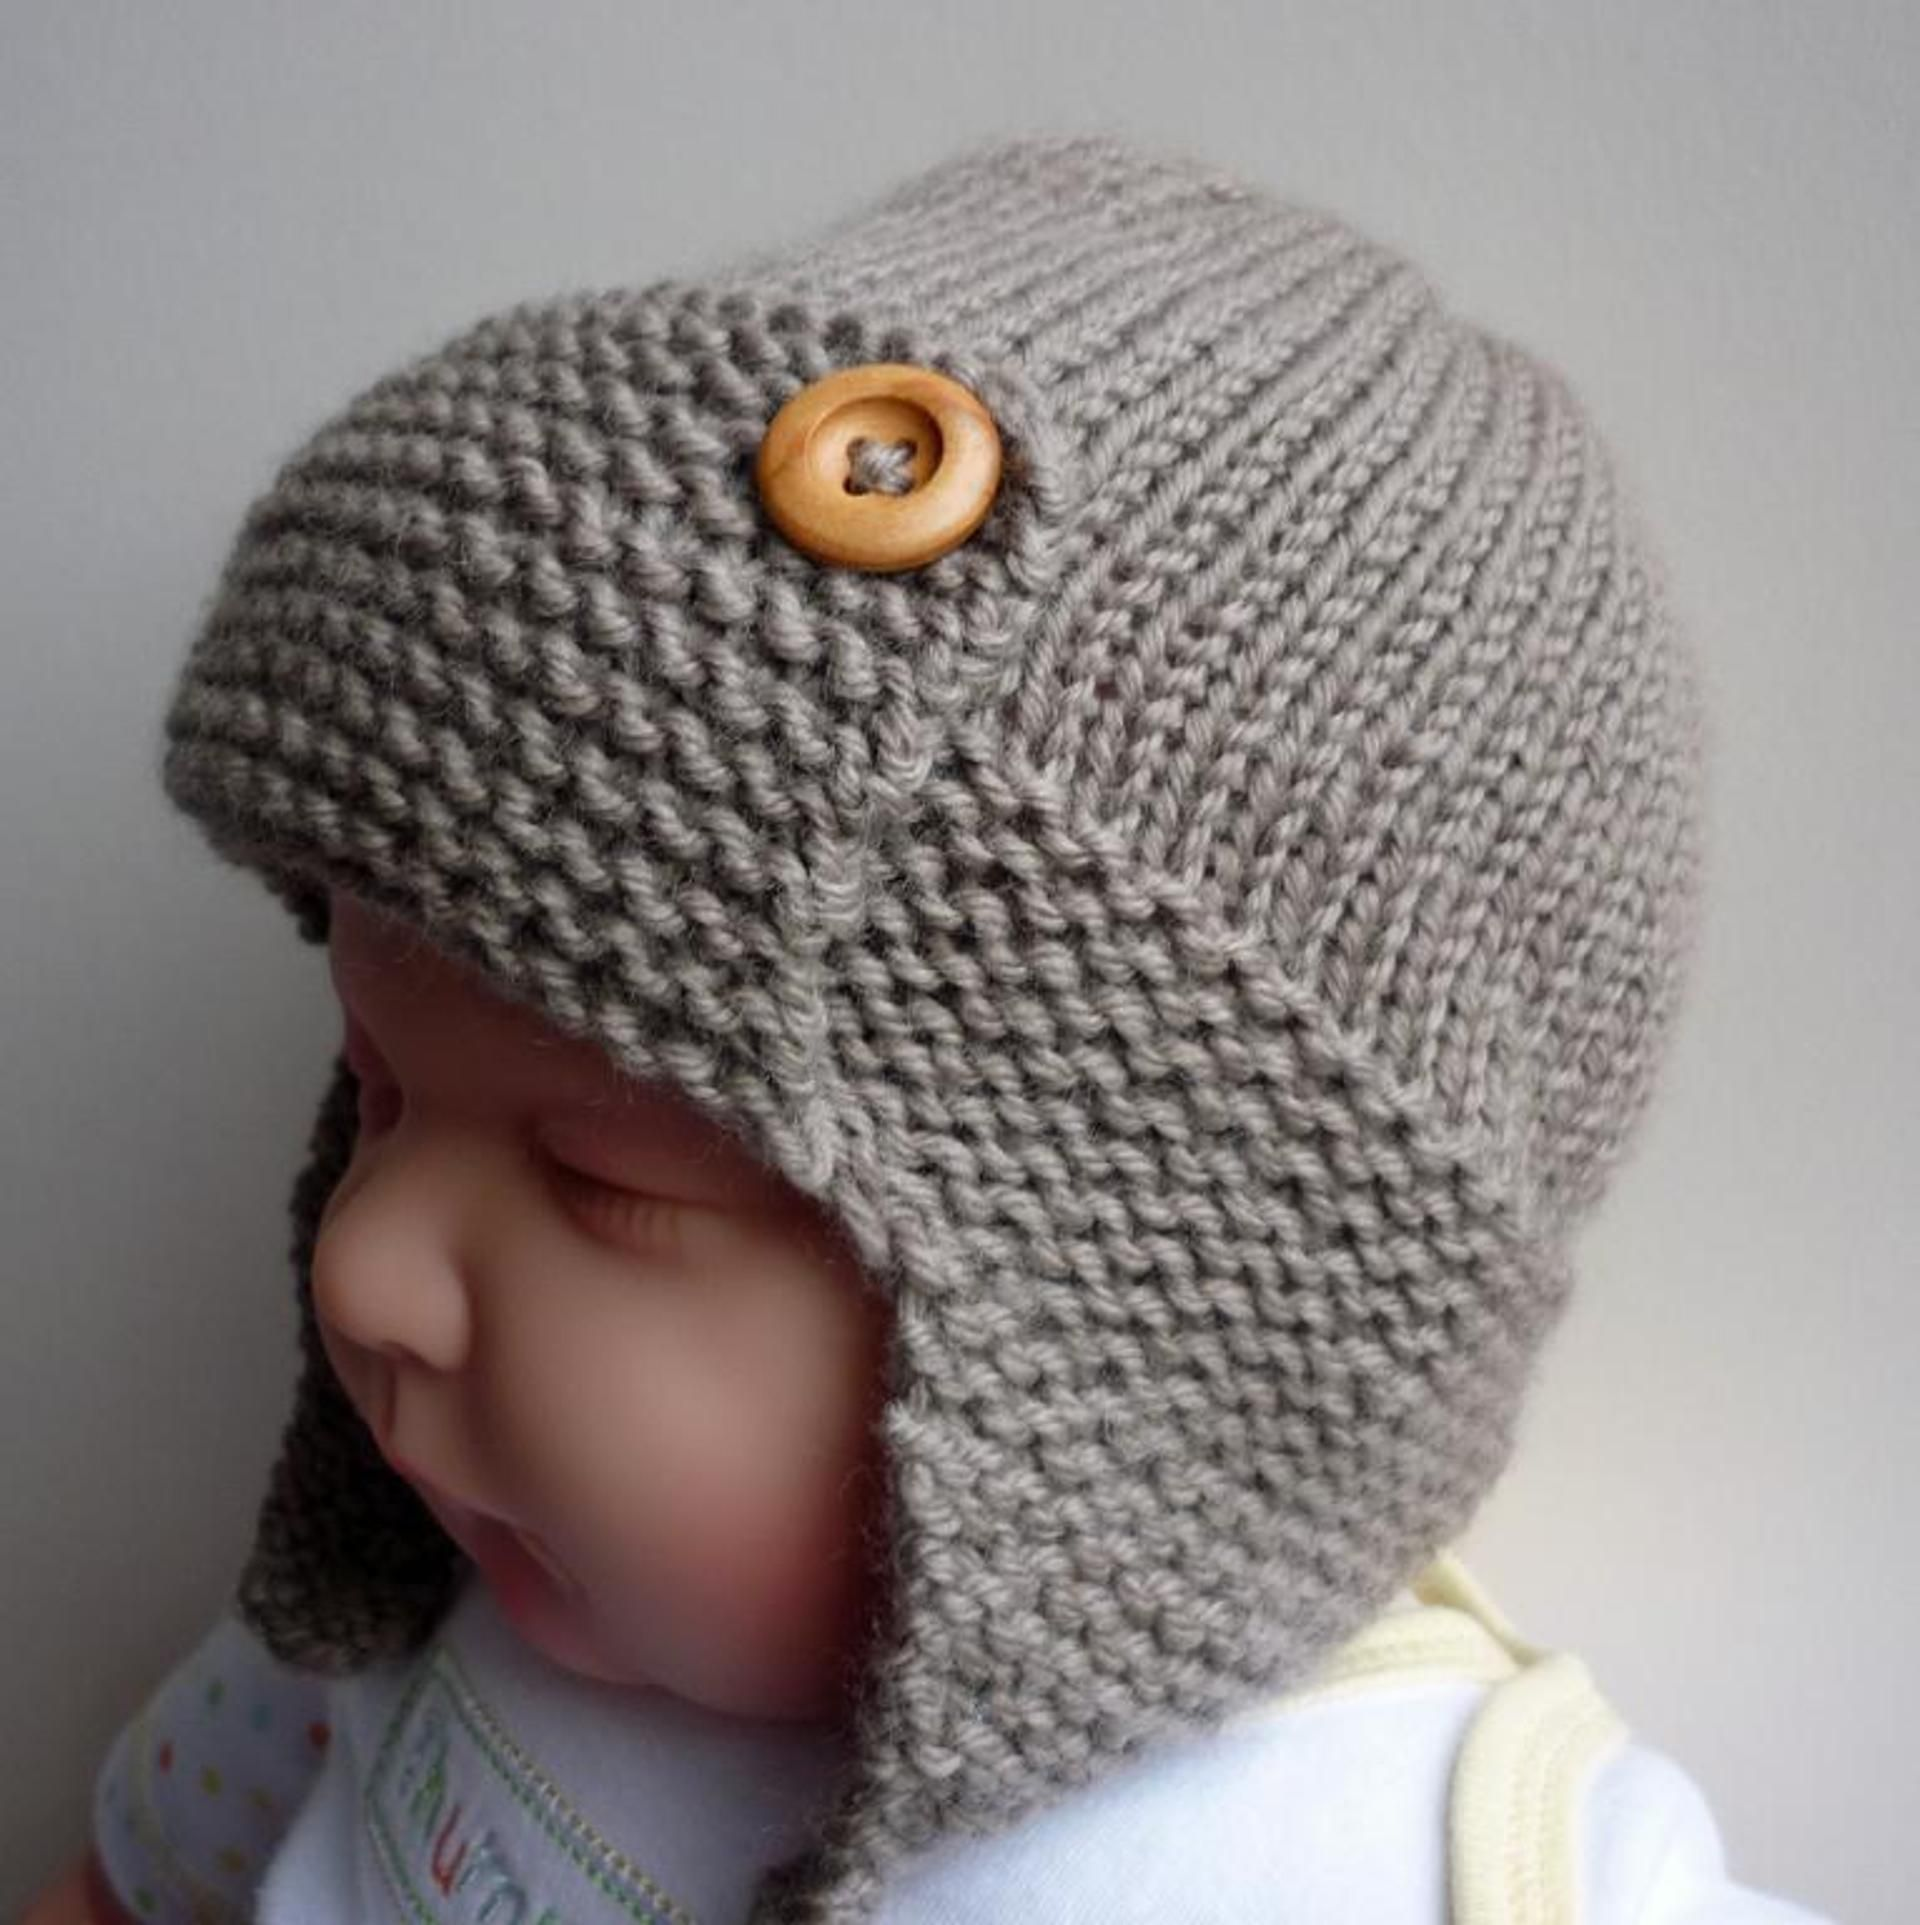 Baby Aviator Hat - Regan   Pinterest   Aviator hat, Knitting ...